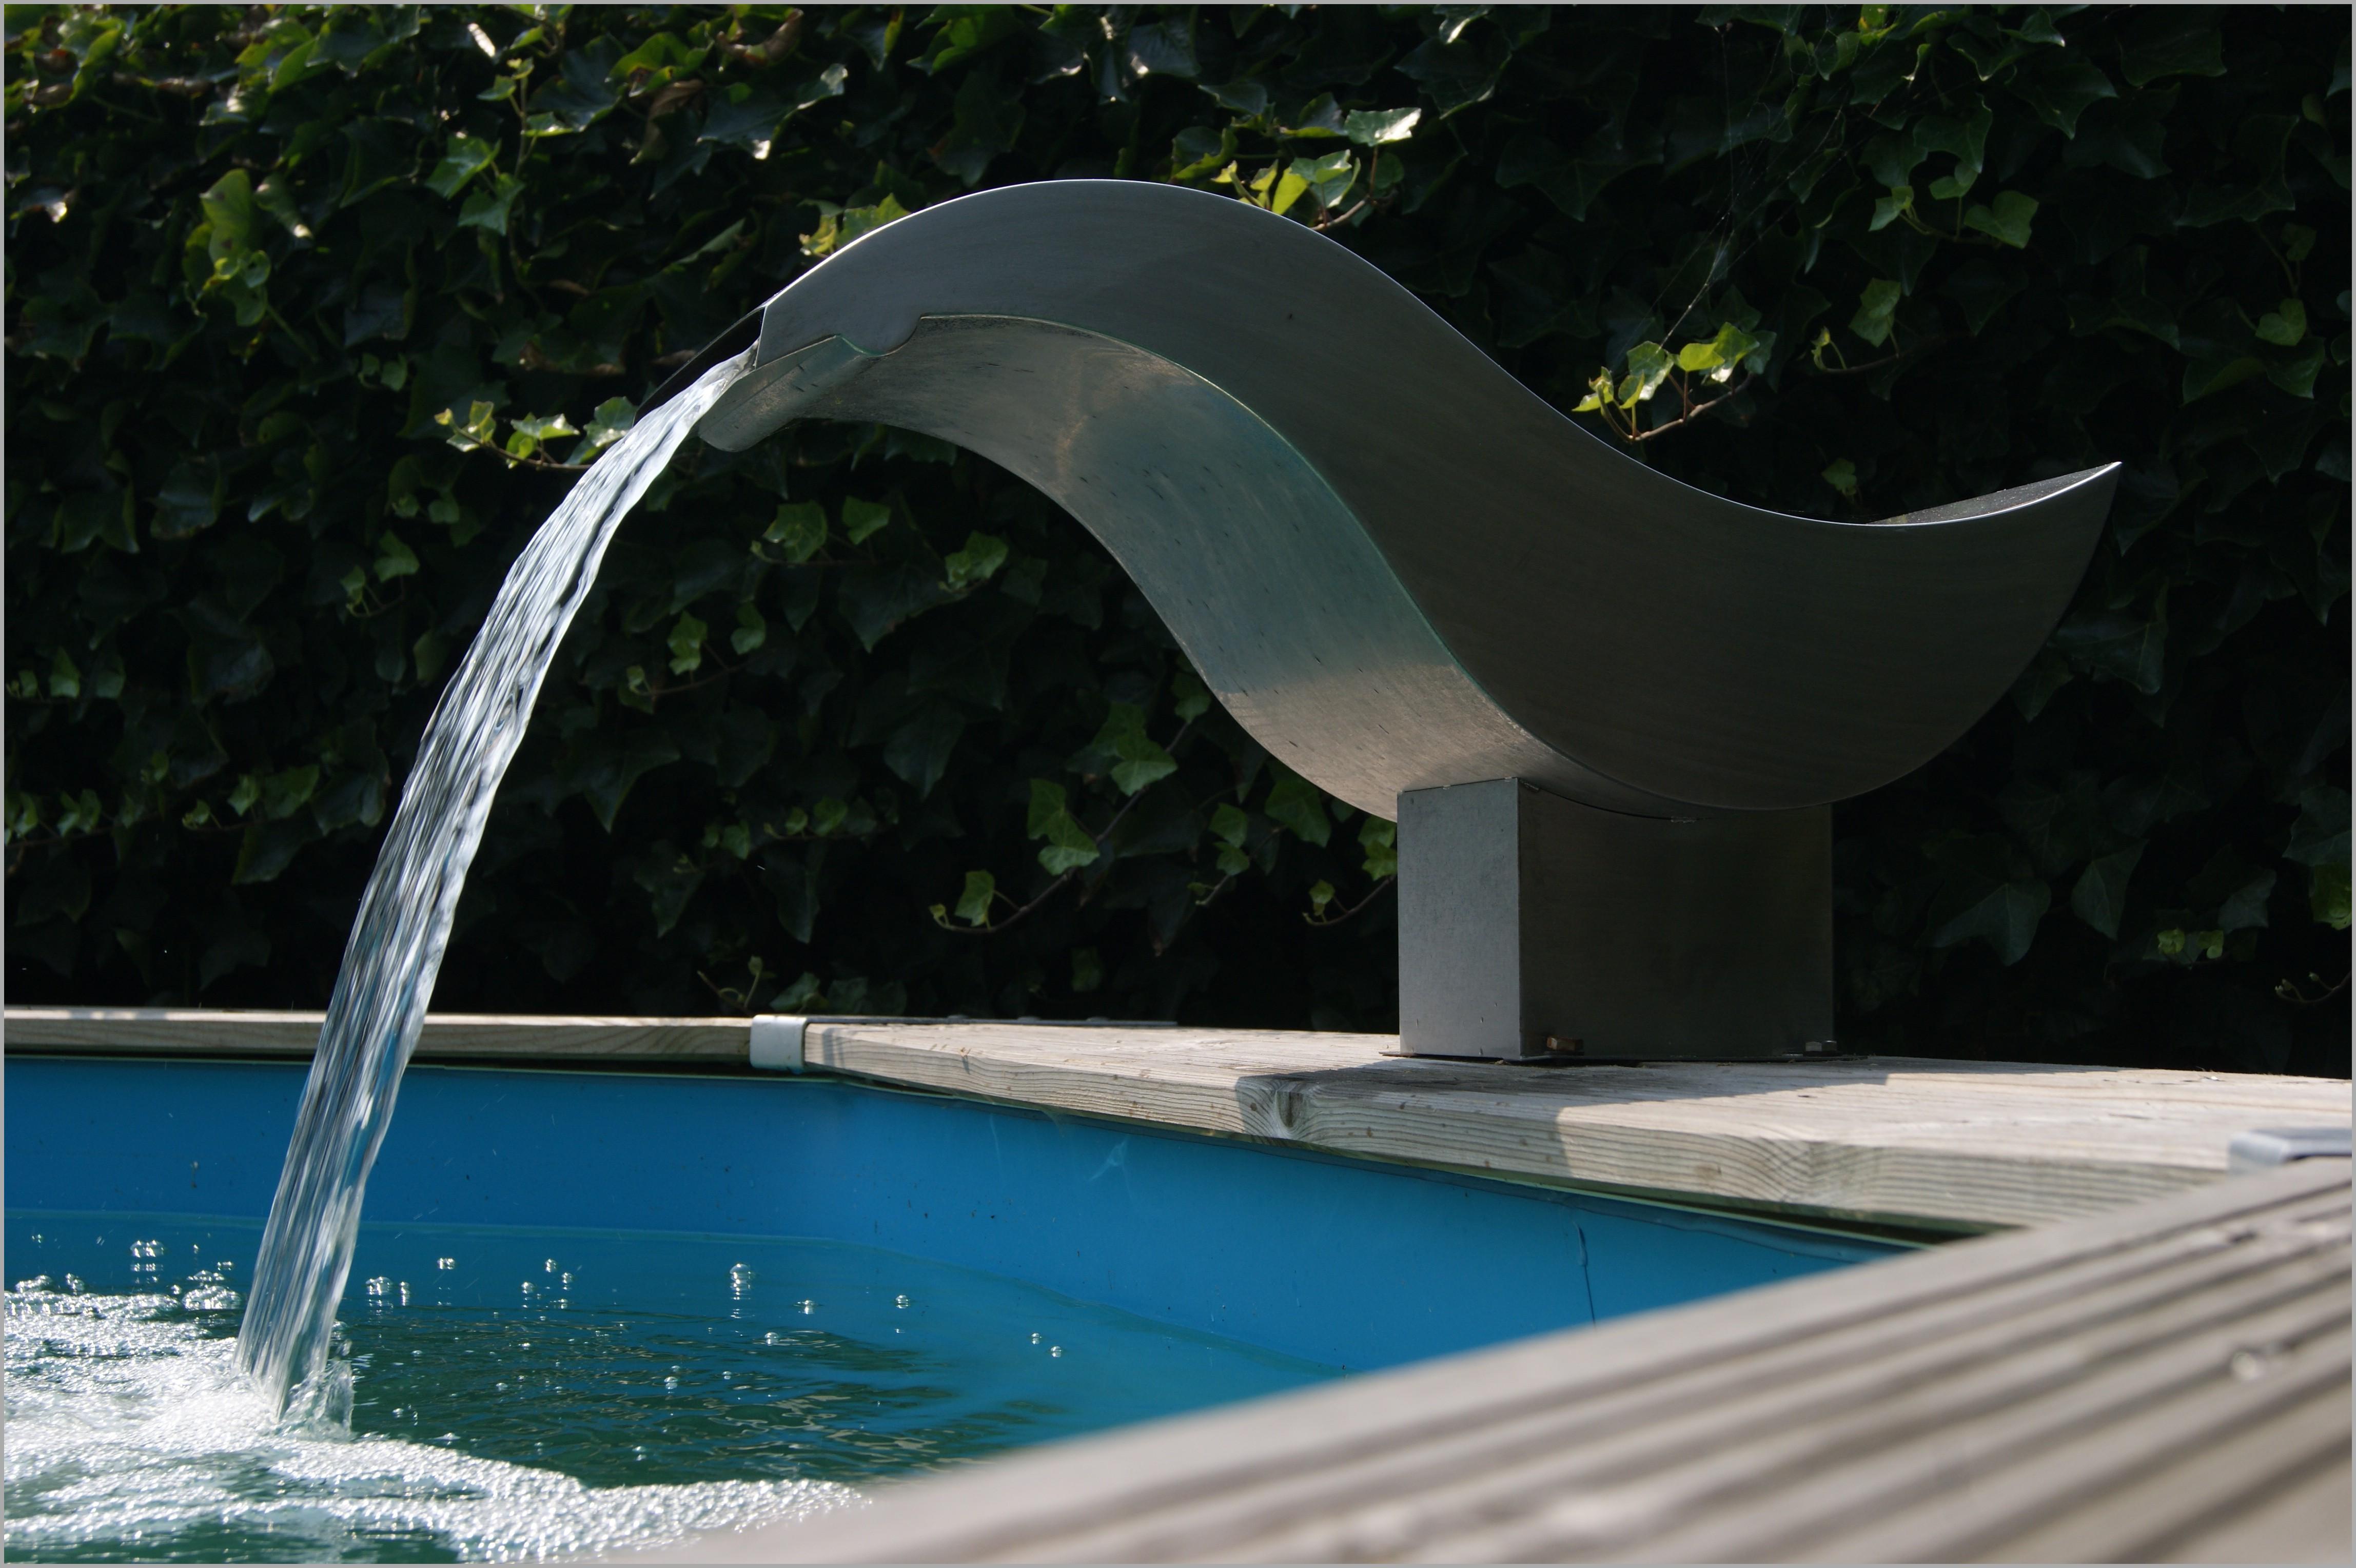 cascade piscine inox pas cher. Black Bedroom Furniture Sets. Home Design Ideas